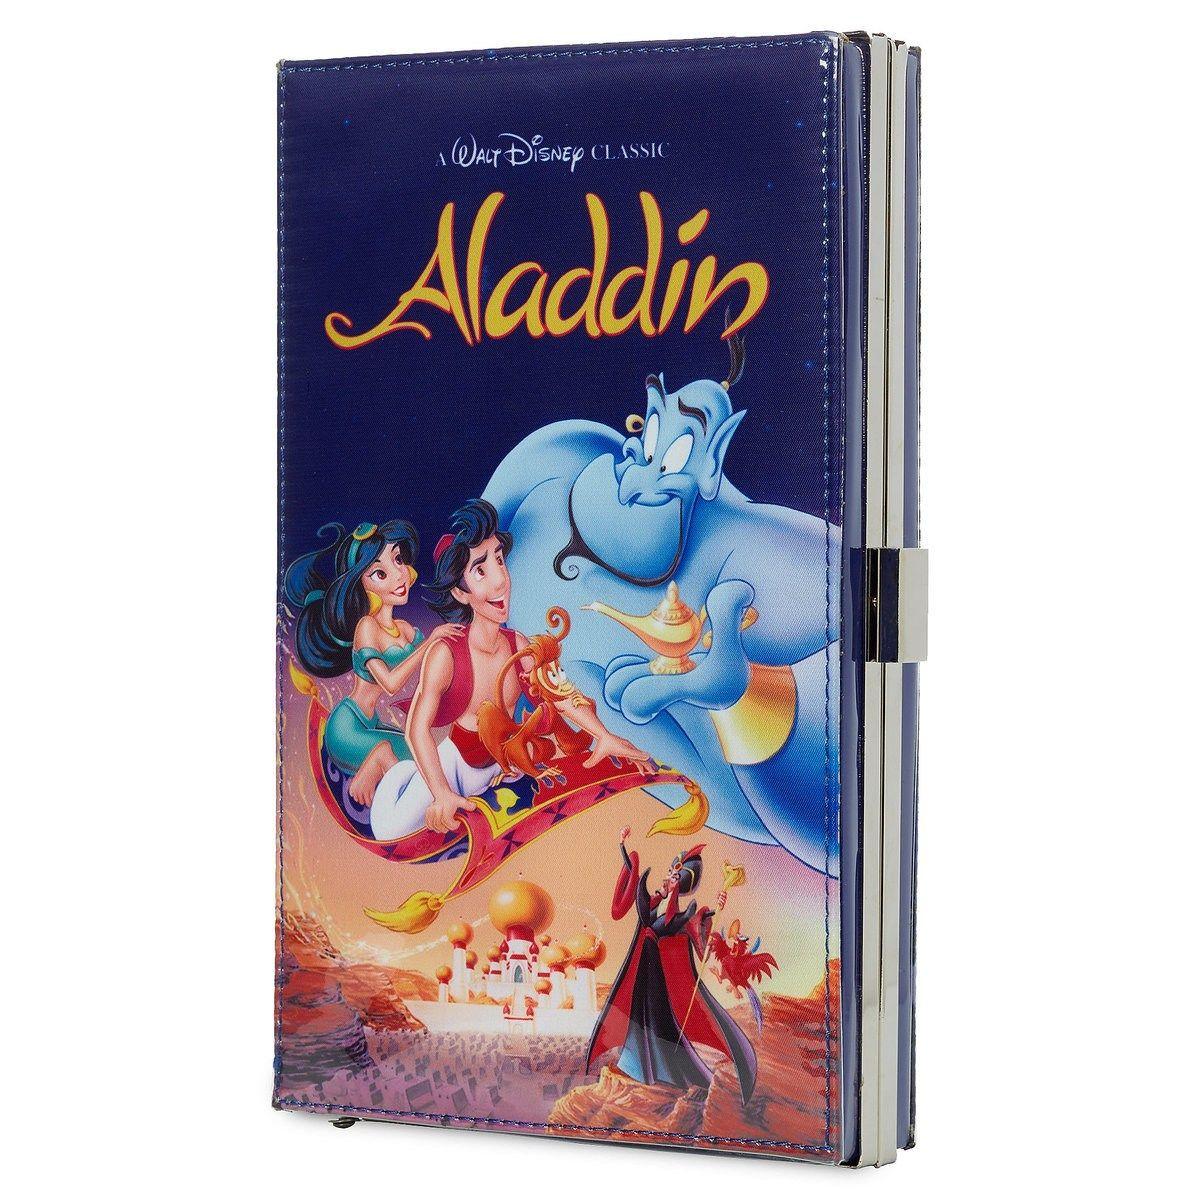 Aladdin VHS Clutch